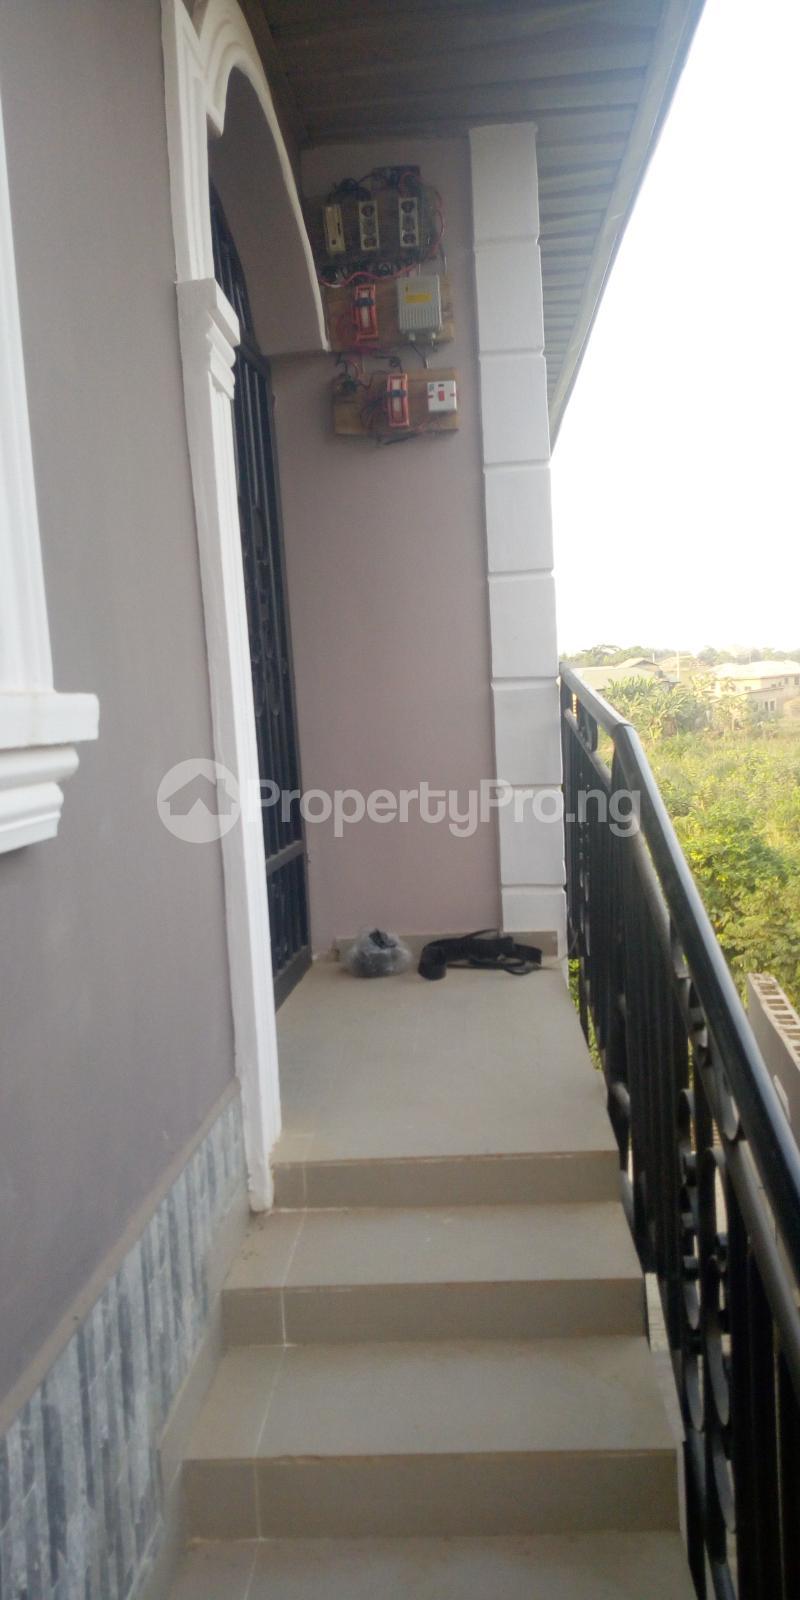 2 bedroom Flat / Apartment for rent - Magboro Obafemi Owode Ogun - 9